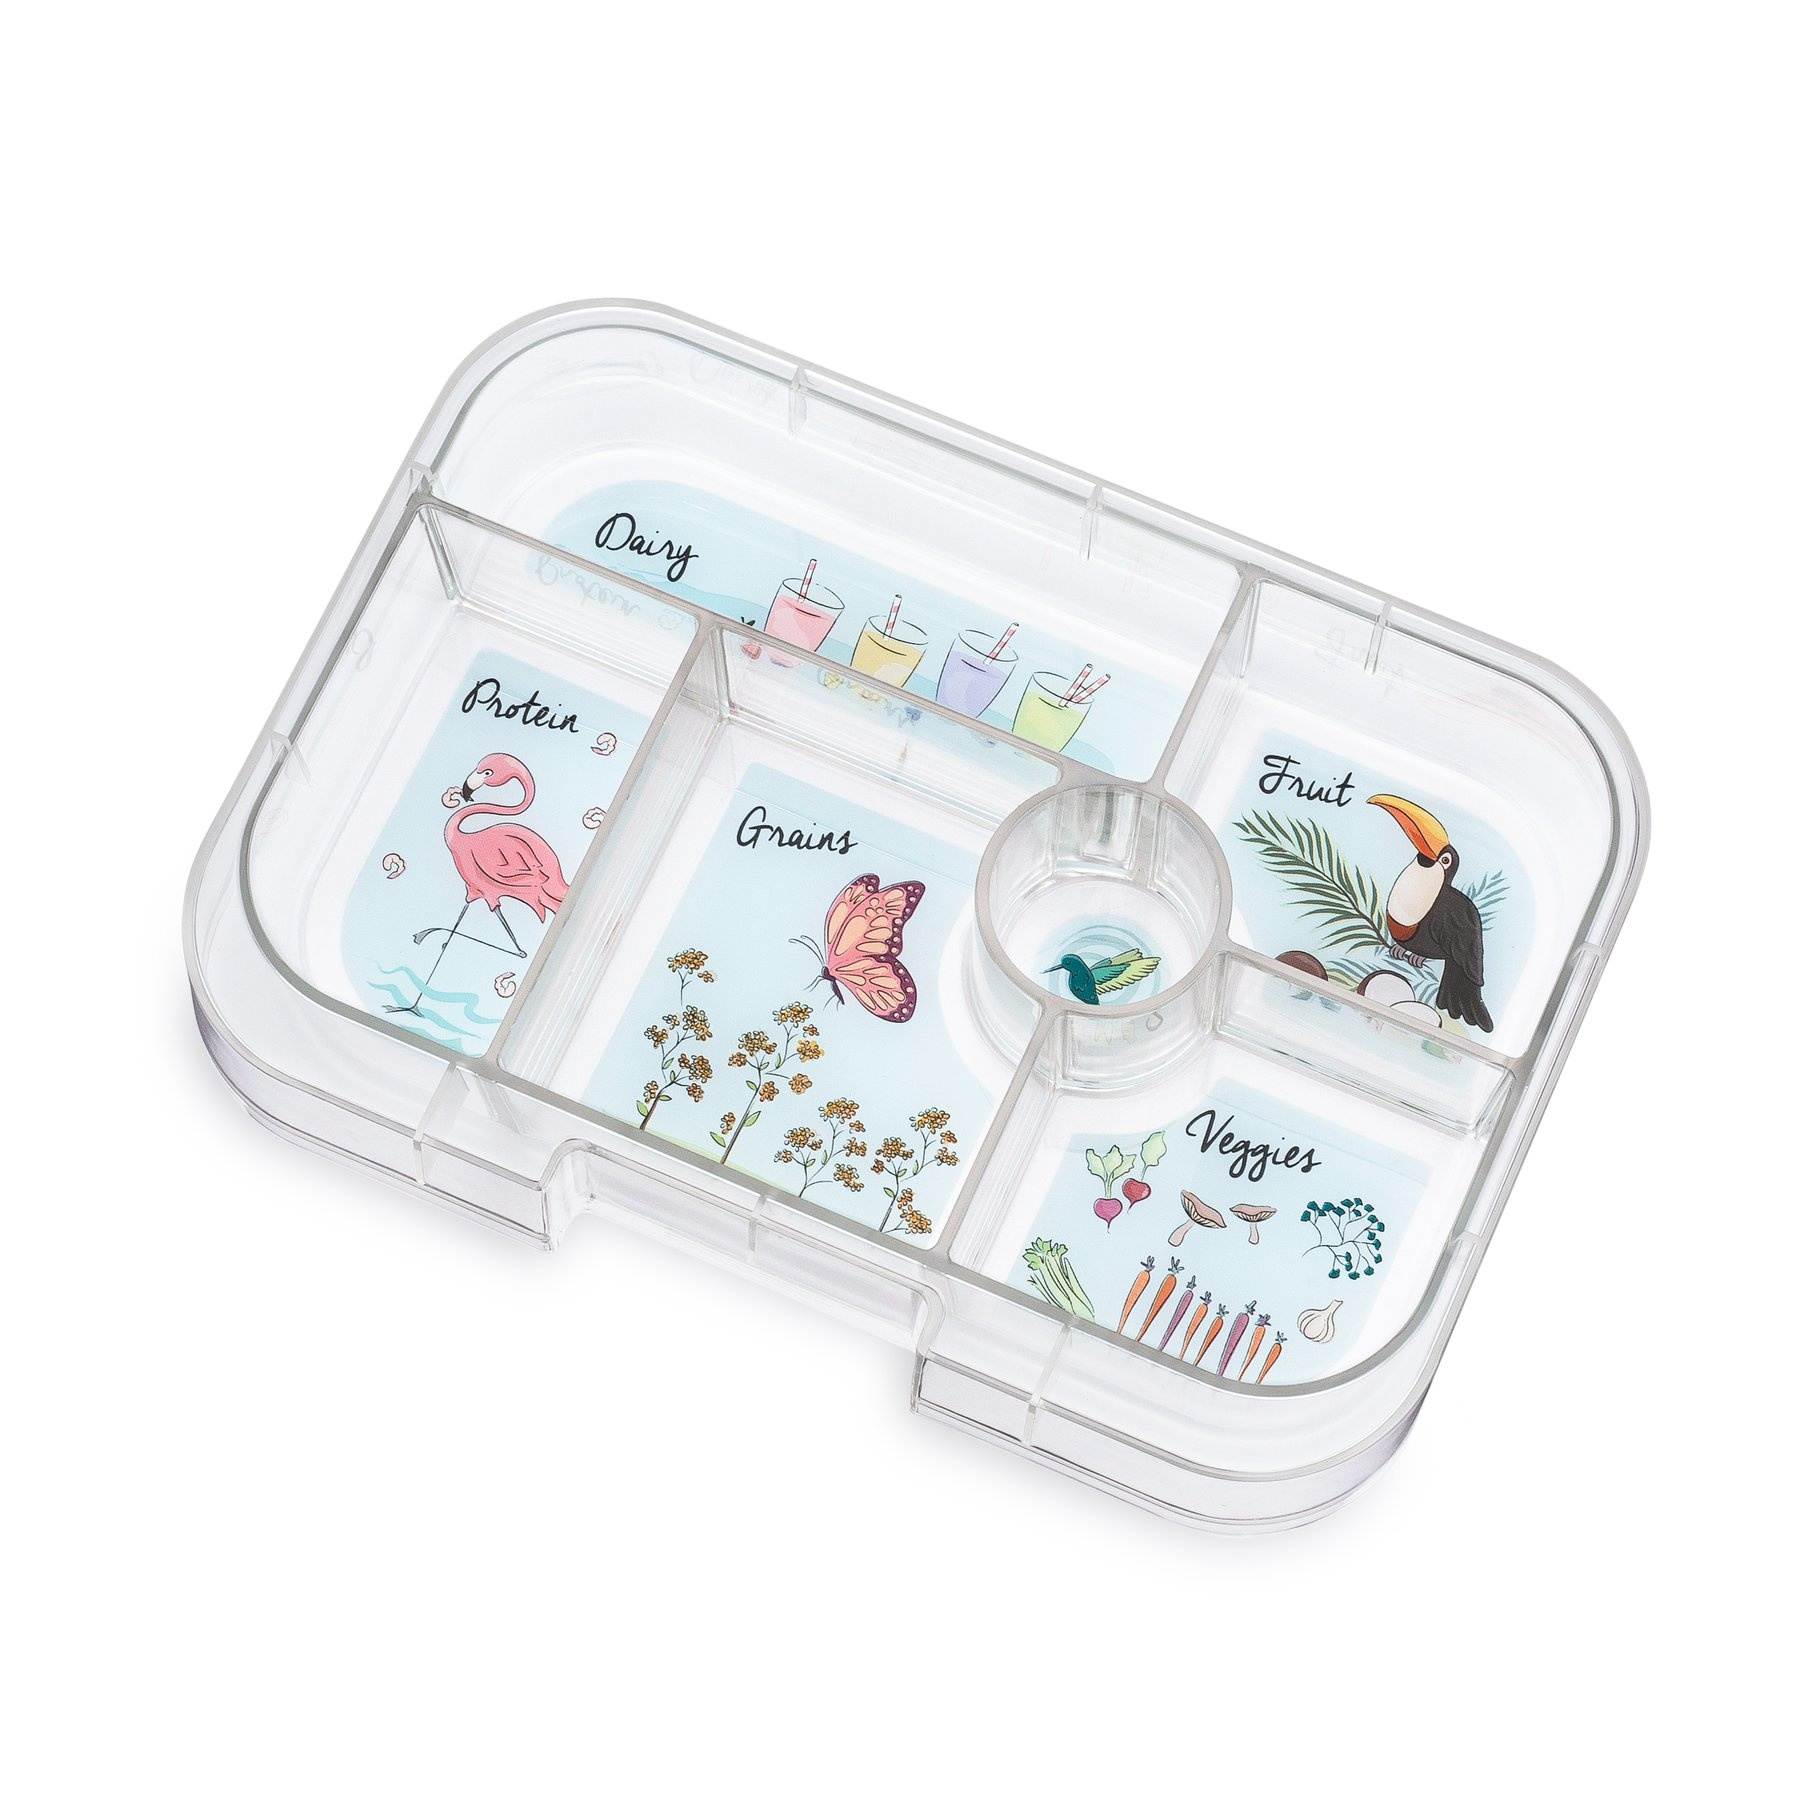 Yumbox Yumbox Original - Leakproof Bento Lunch Box (6 compartment)